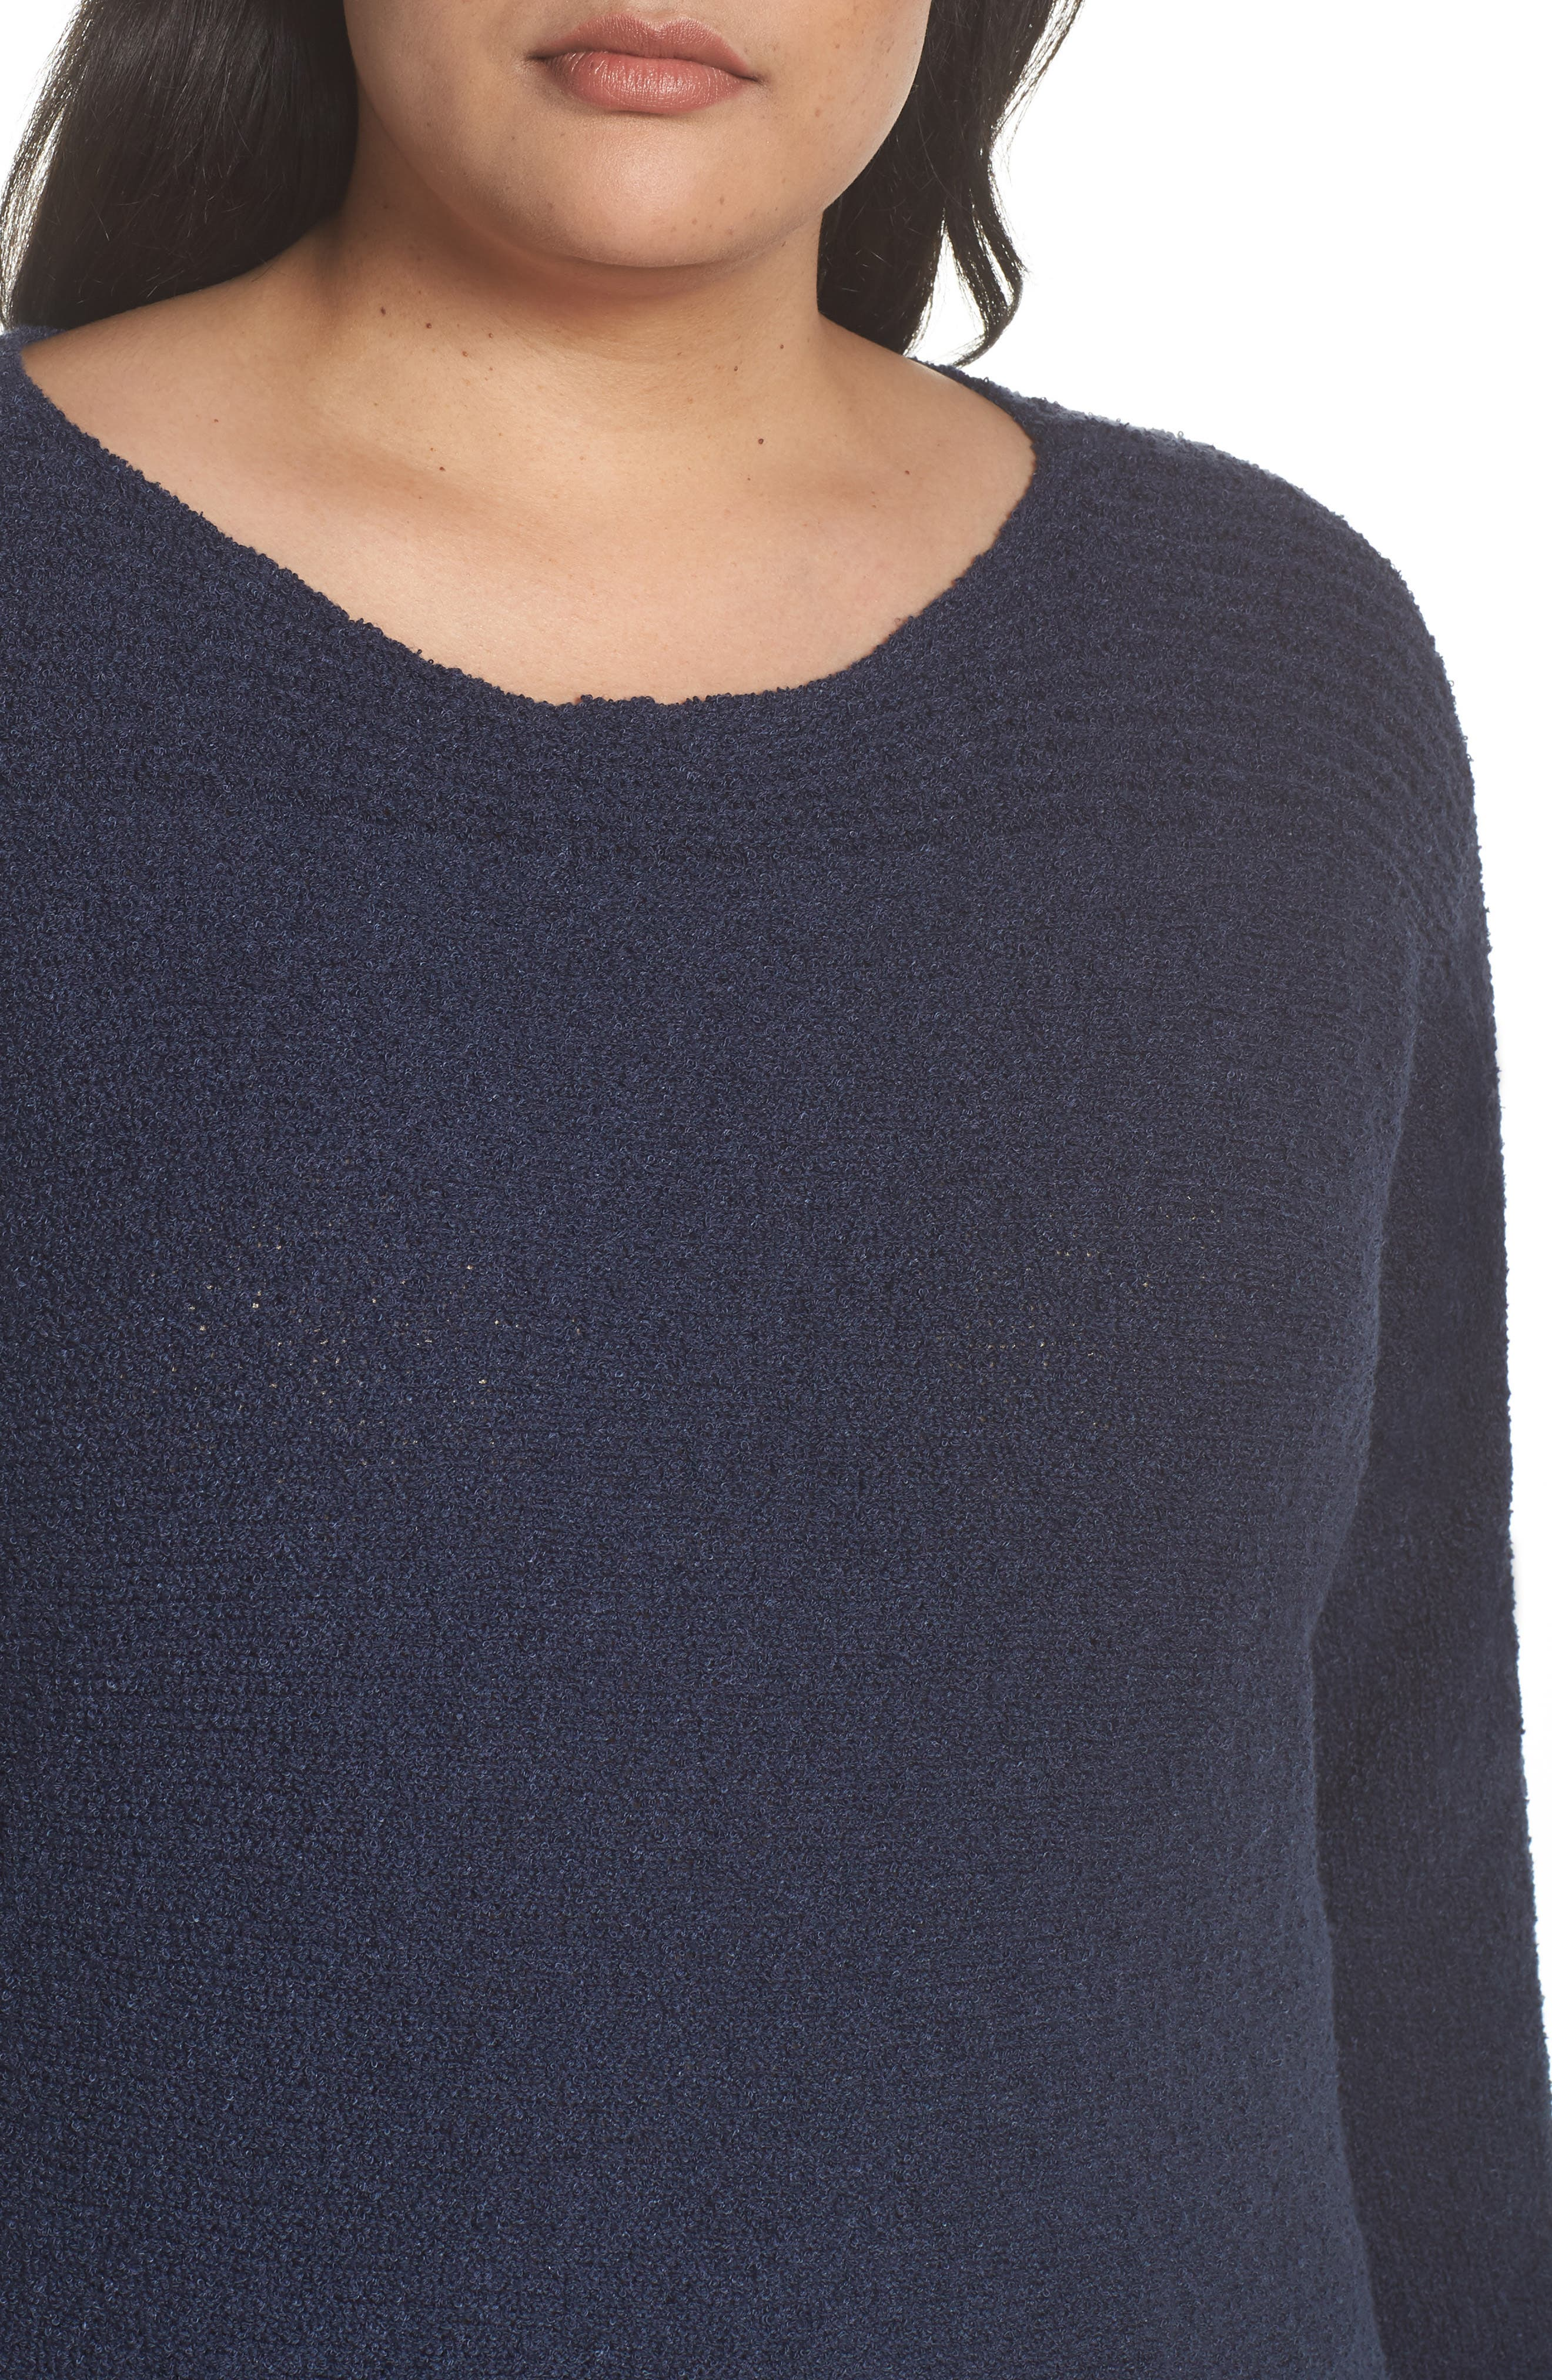 Horizontal Pullover Sweater,                             Alternate thumbnail 4, color,                             410